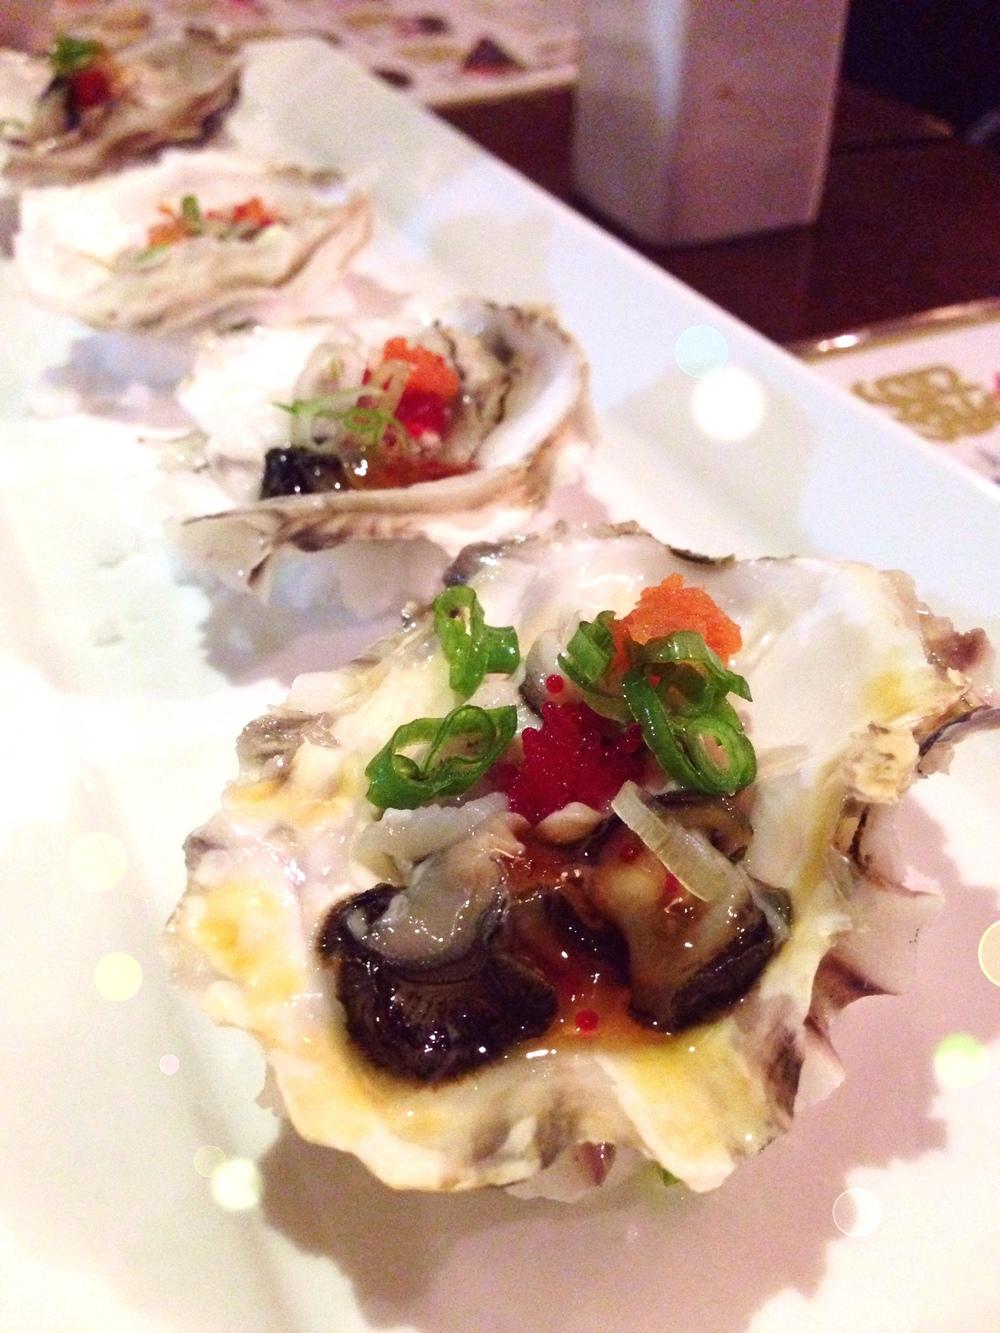 Oyster with Ponzu Sauce: Seasonal oyster, scallion, momiji oroshi, tobiko, ponzu jello.